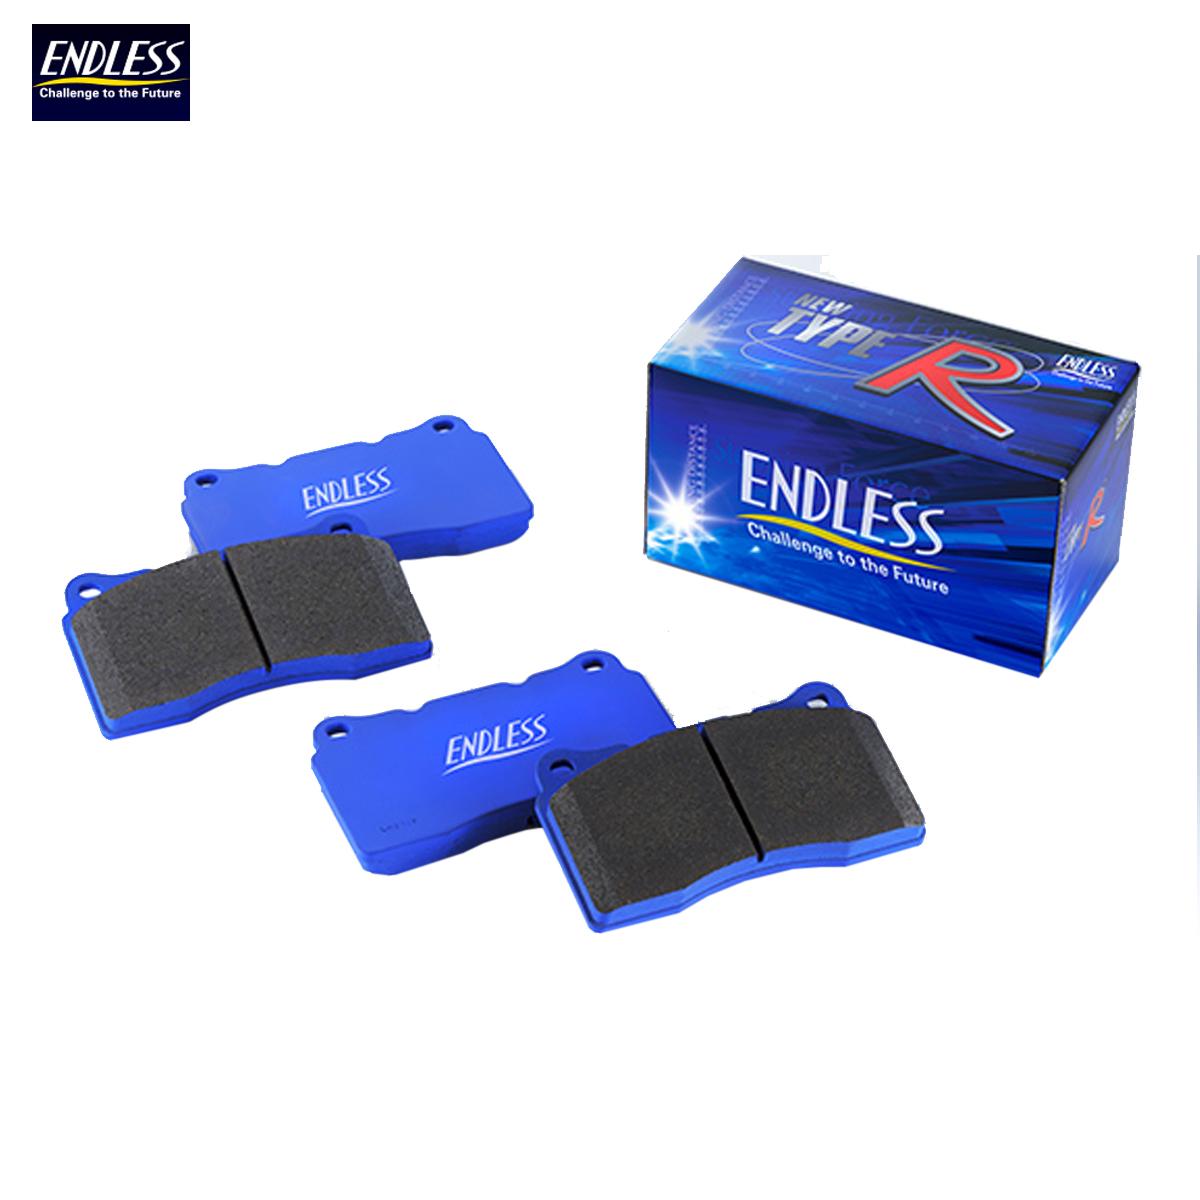 ENDLESS エンドレス ブレーキパッド タイプRセット フロント EP292 リア EP354 ヴェロッサ JZX110 ターボ